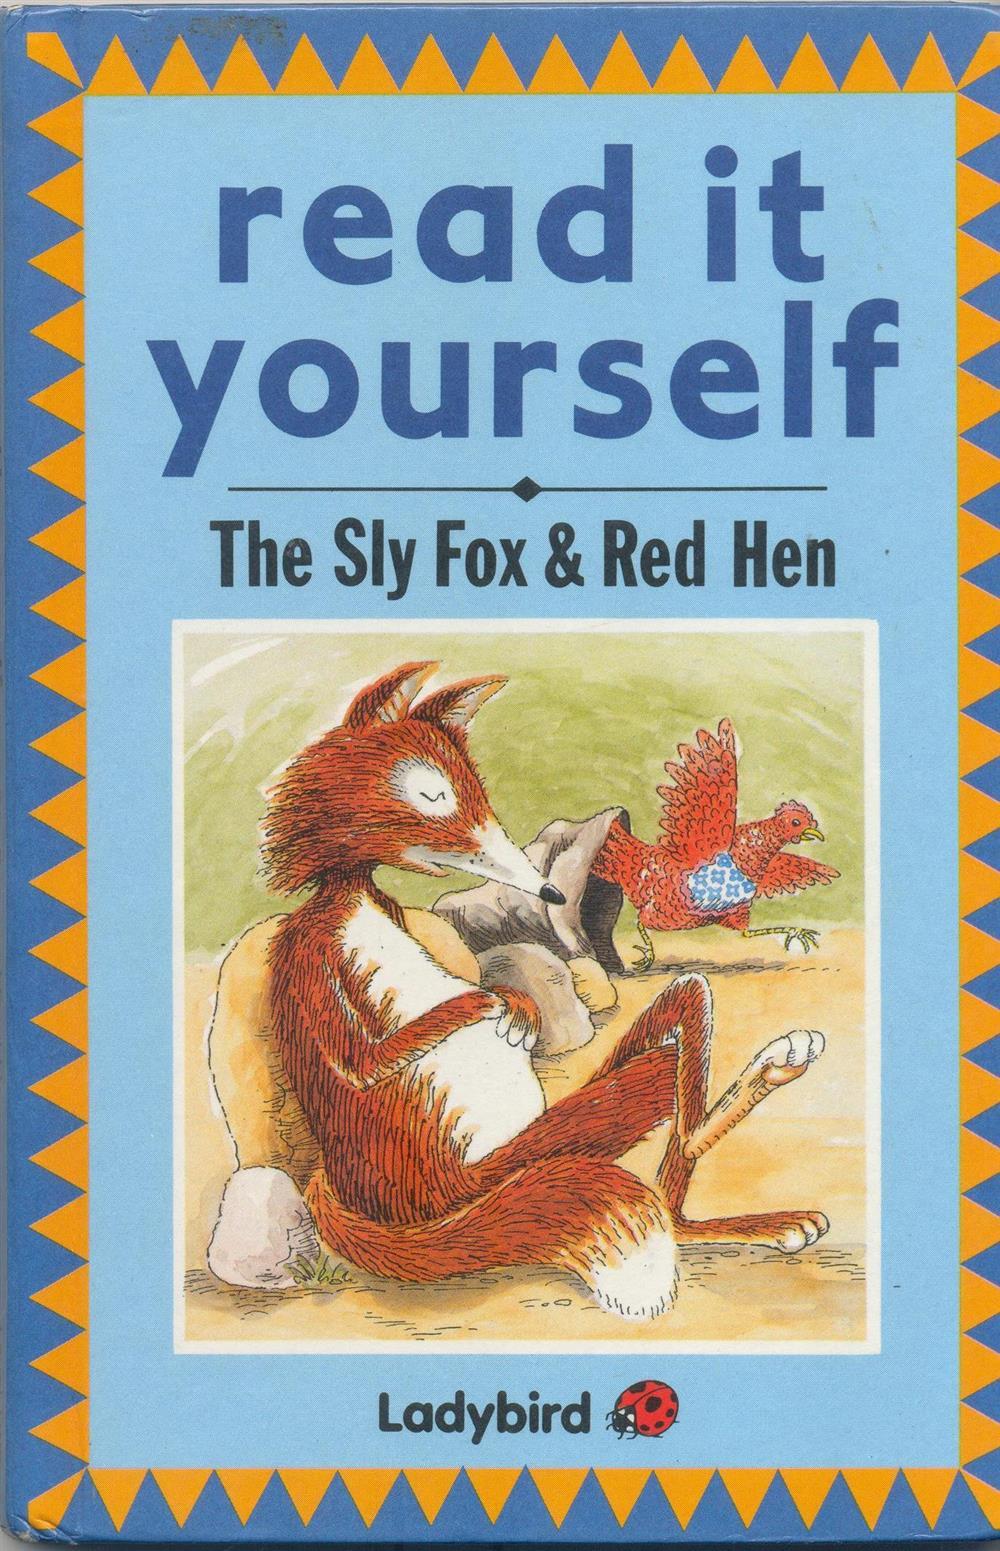 The sly fox & red hen 001.jpg